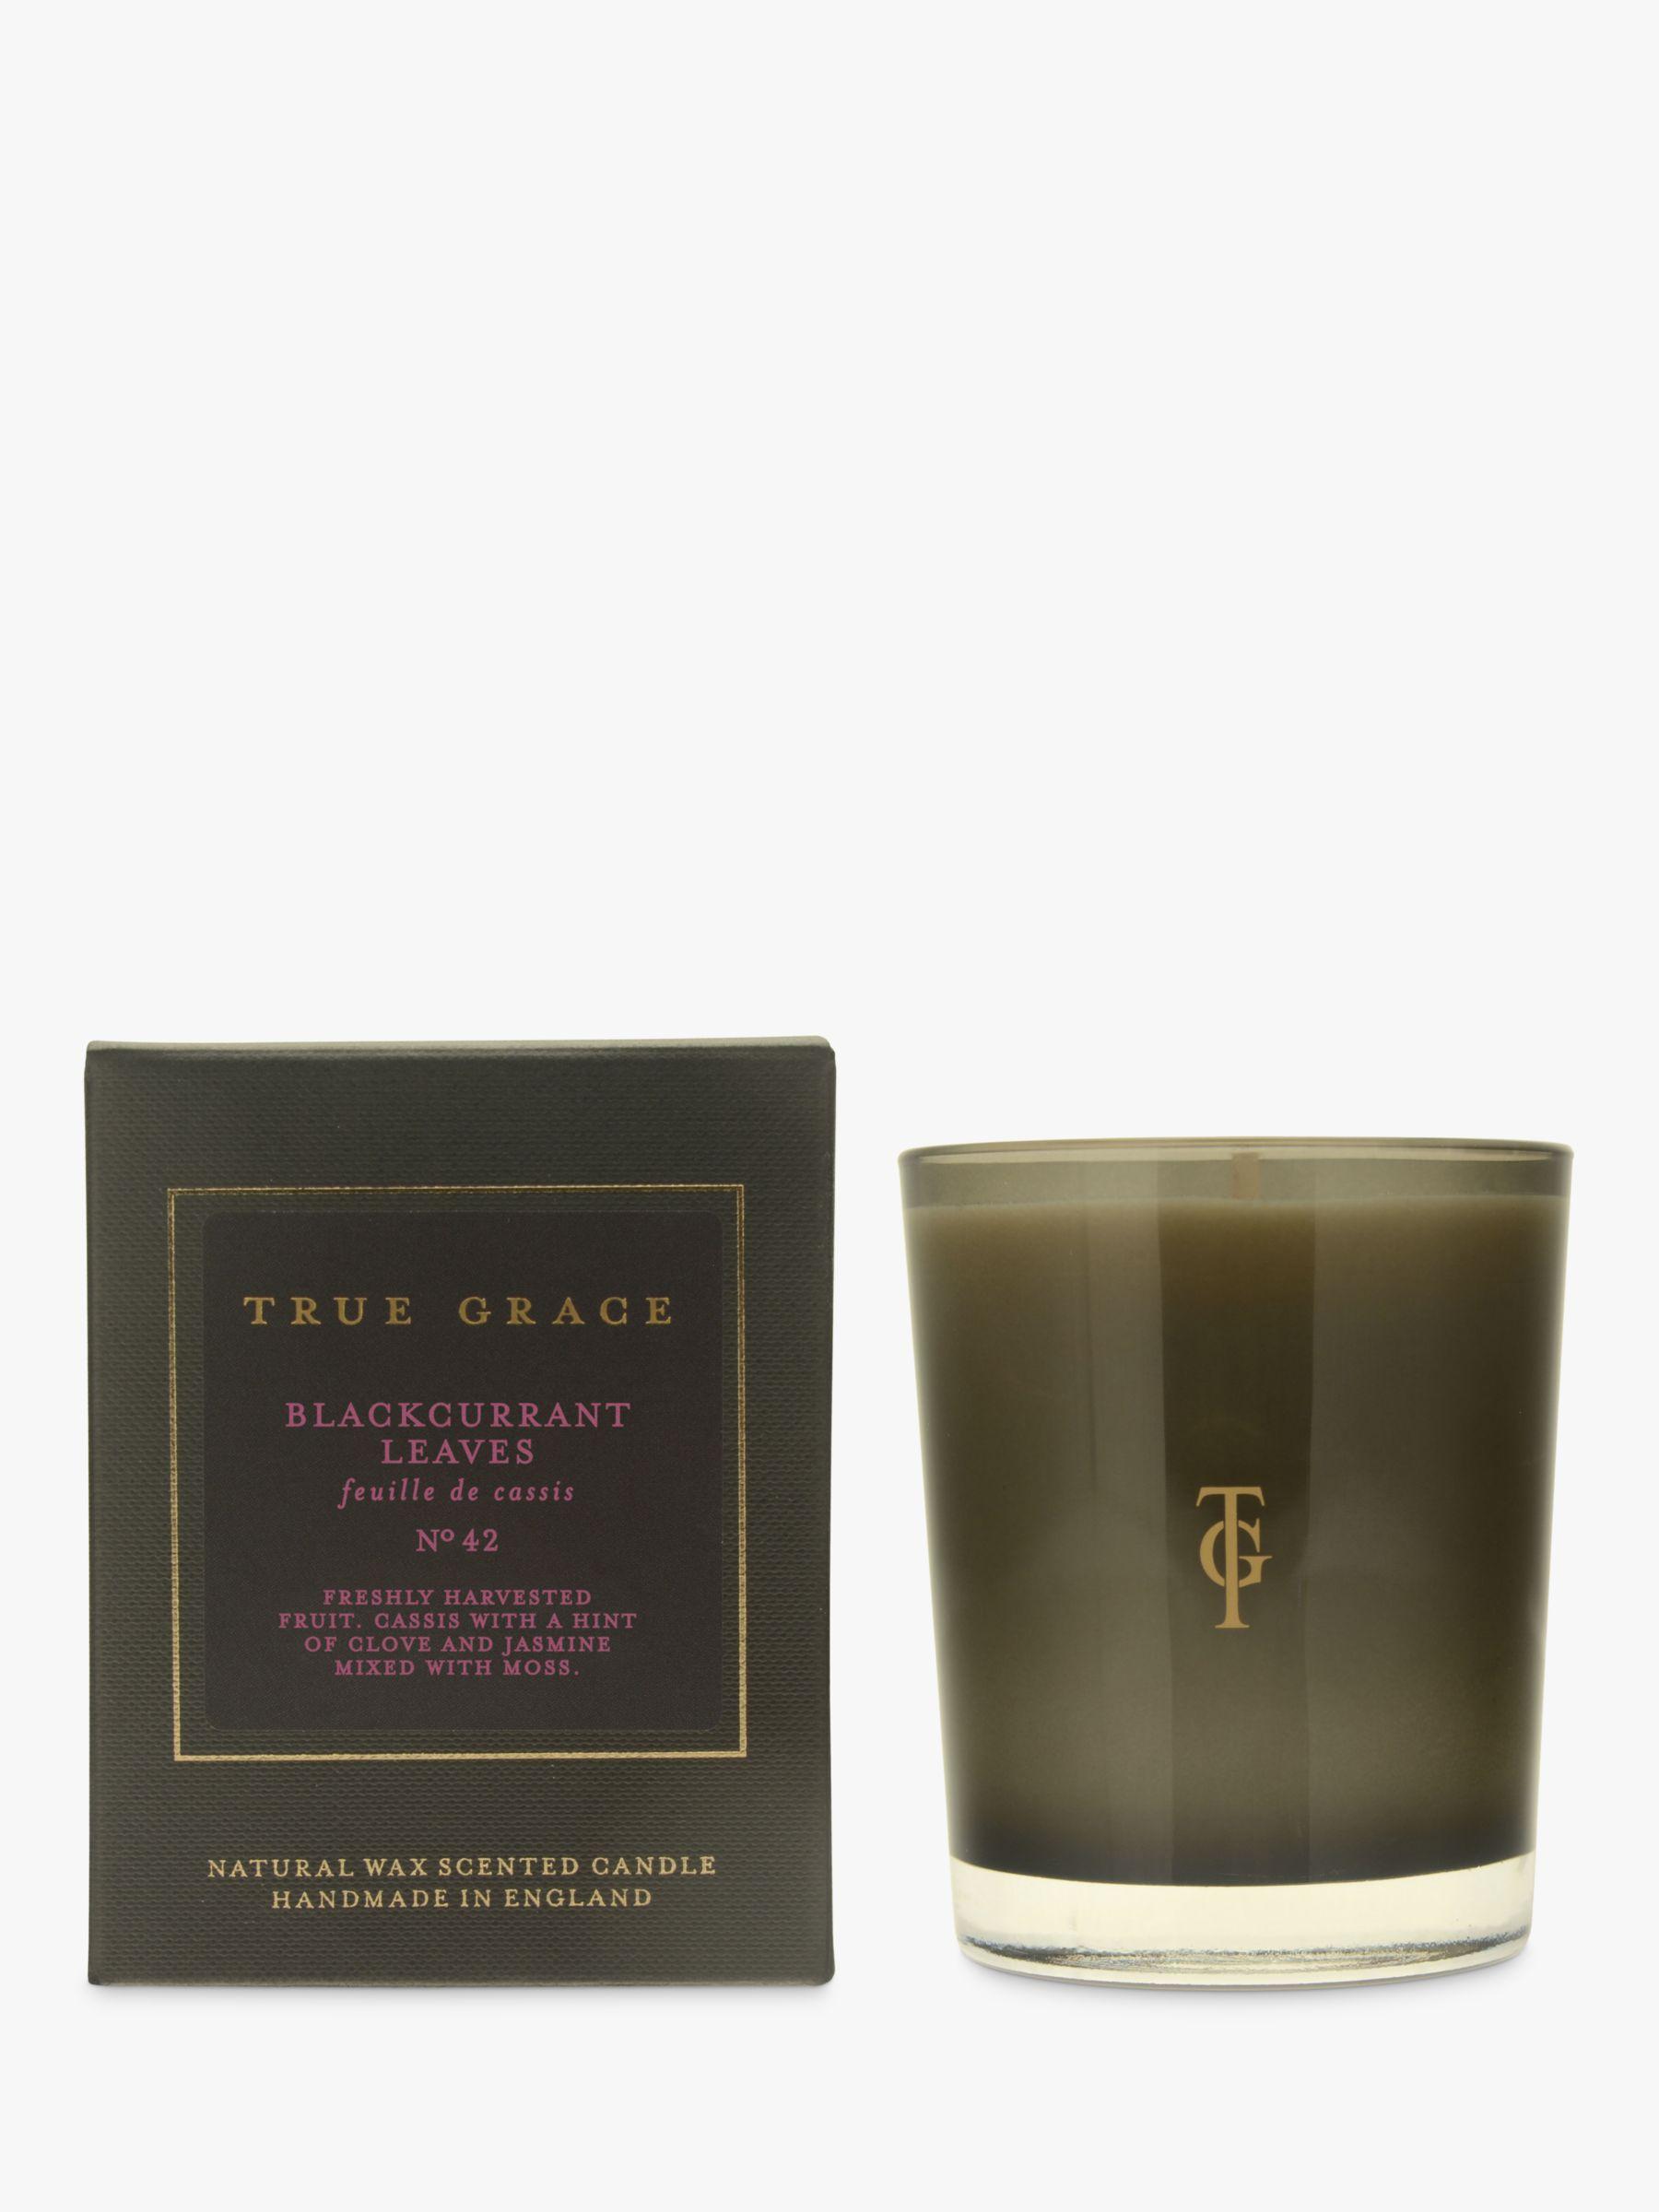 True Grace True Grace Blackcurrant Scented Candle, 190g